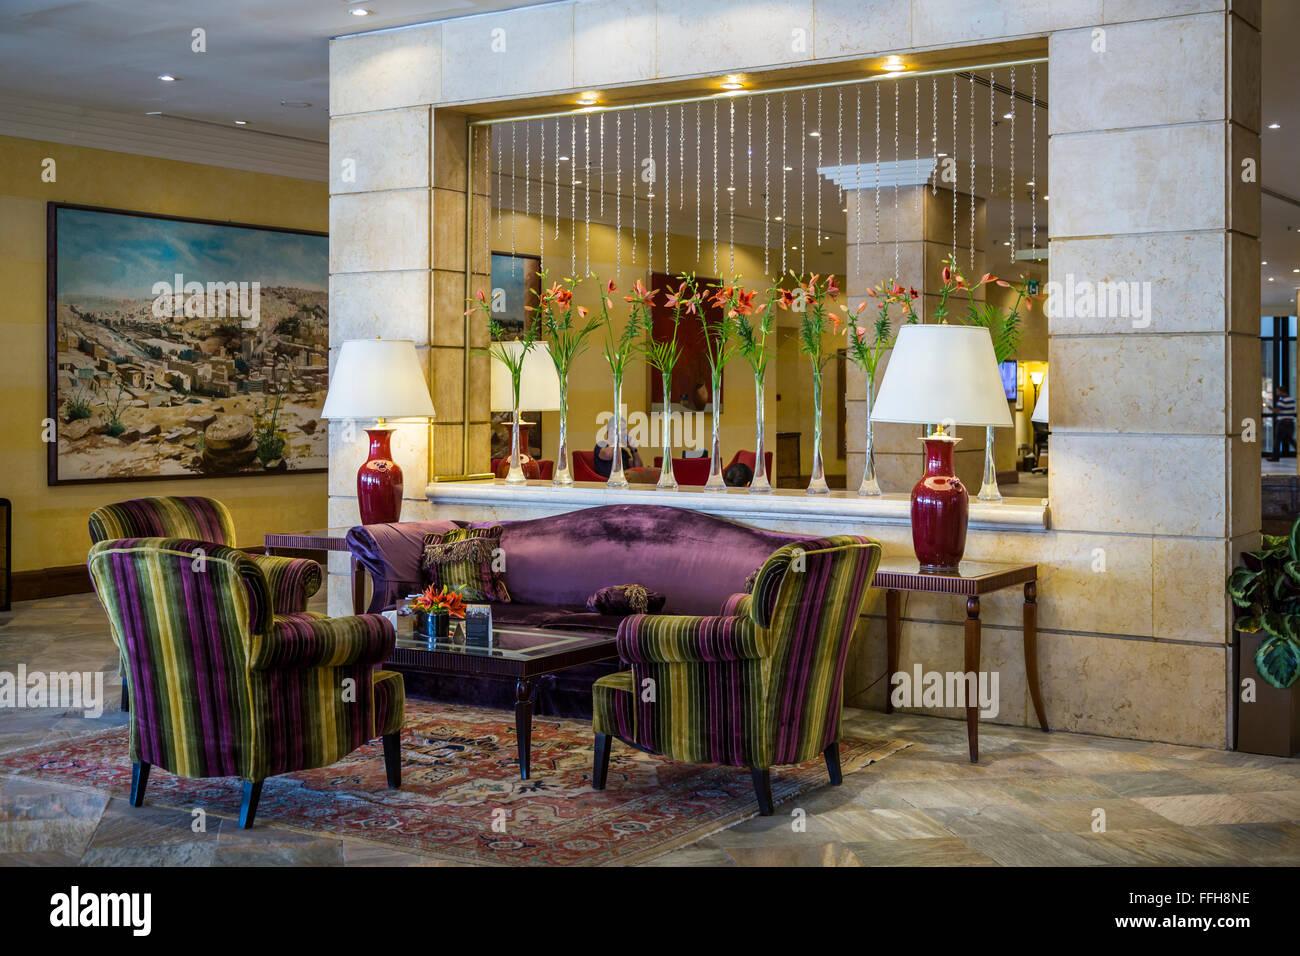 interior decor of the intercontinental hotel in amman hashemite kingdom of jordan middle east